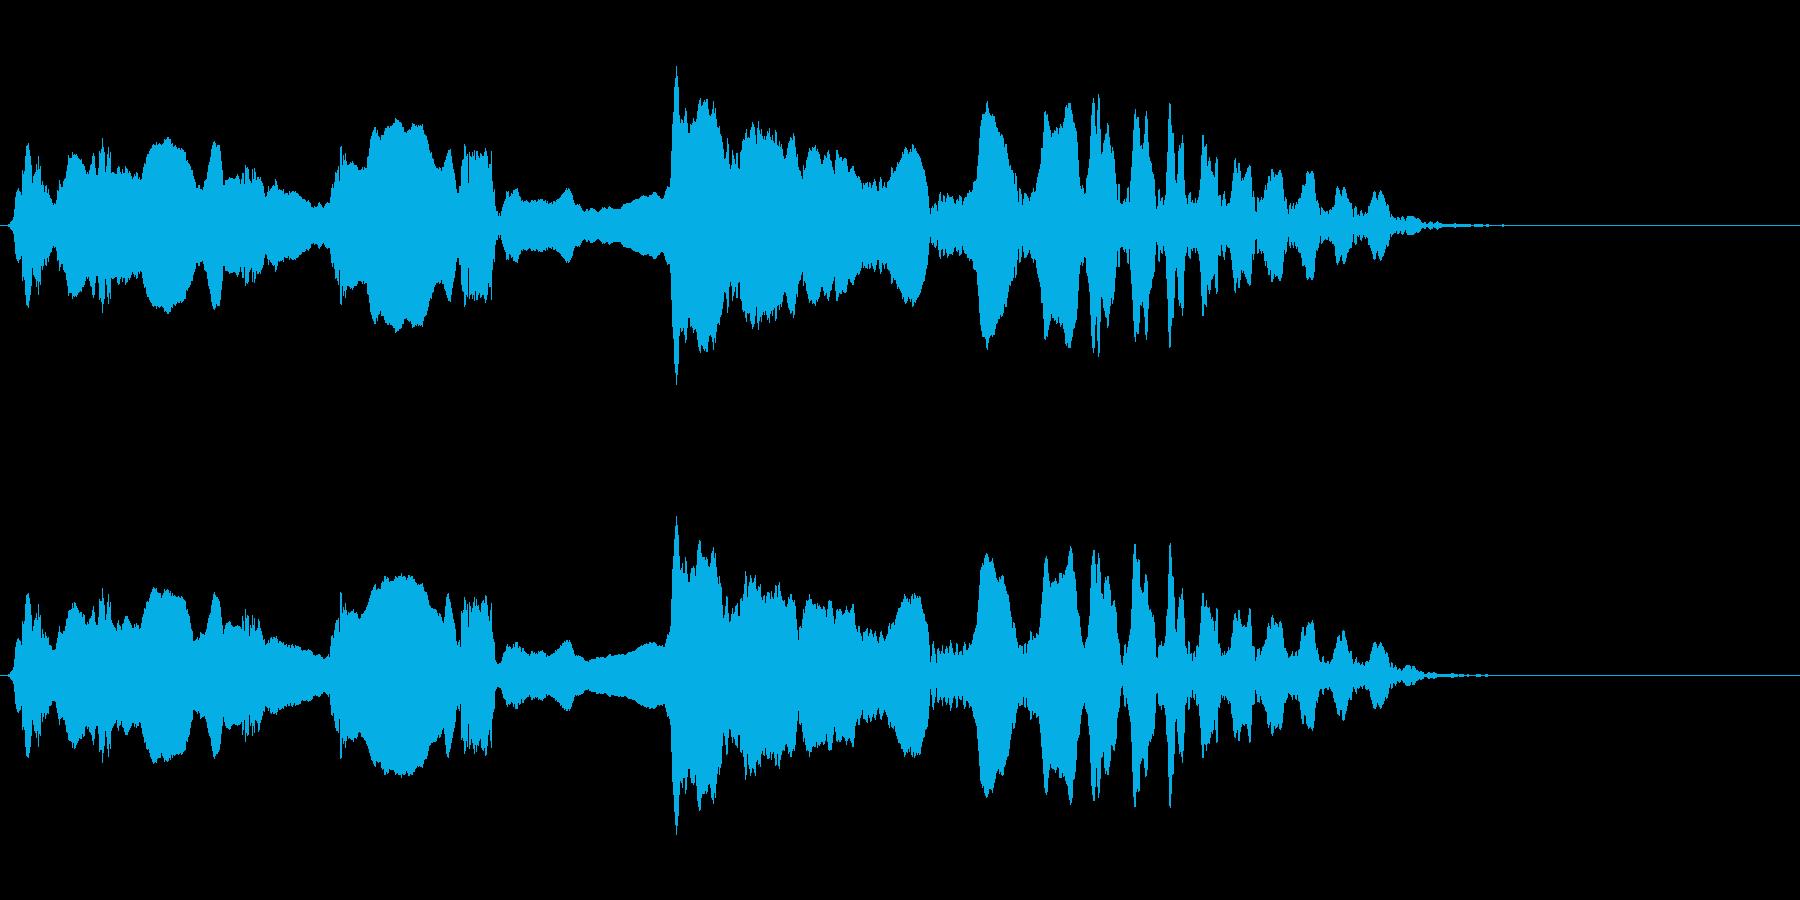 尺八 生演奏 古典風 残響音有 10の再生済みの波形